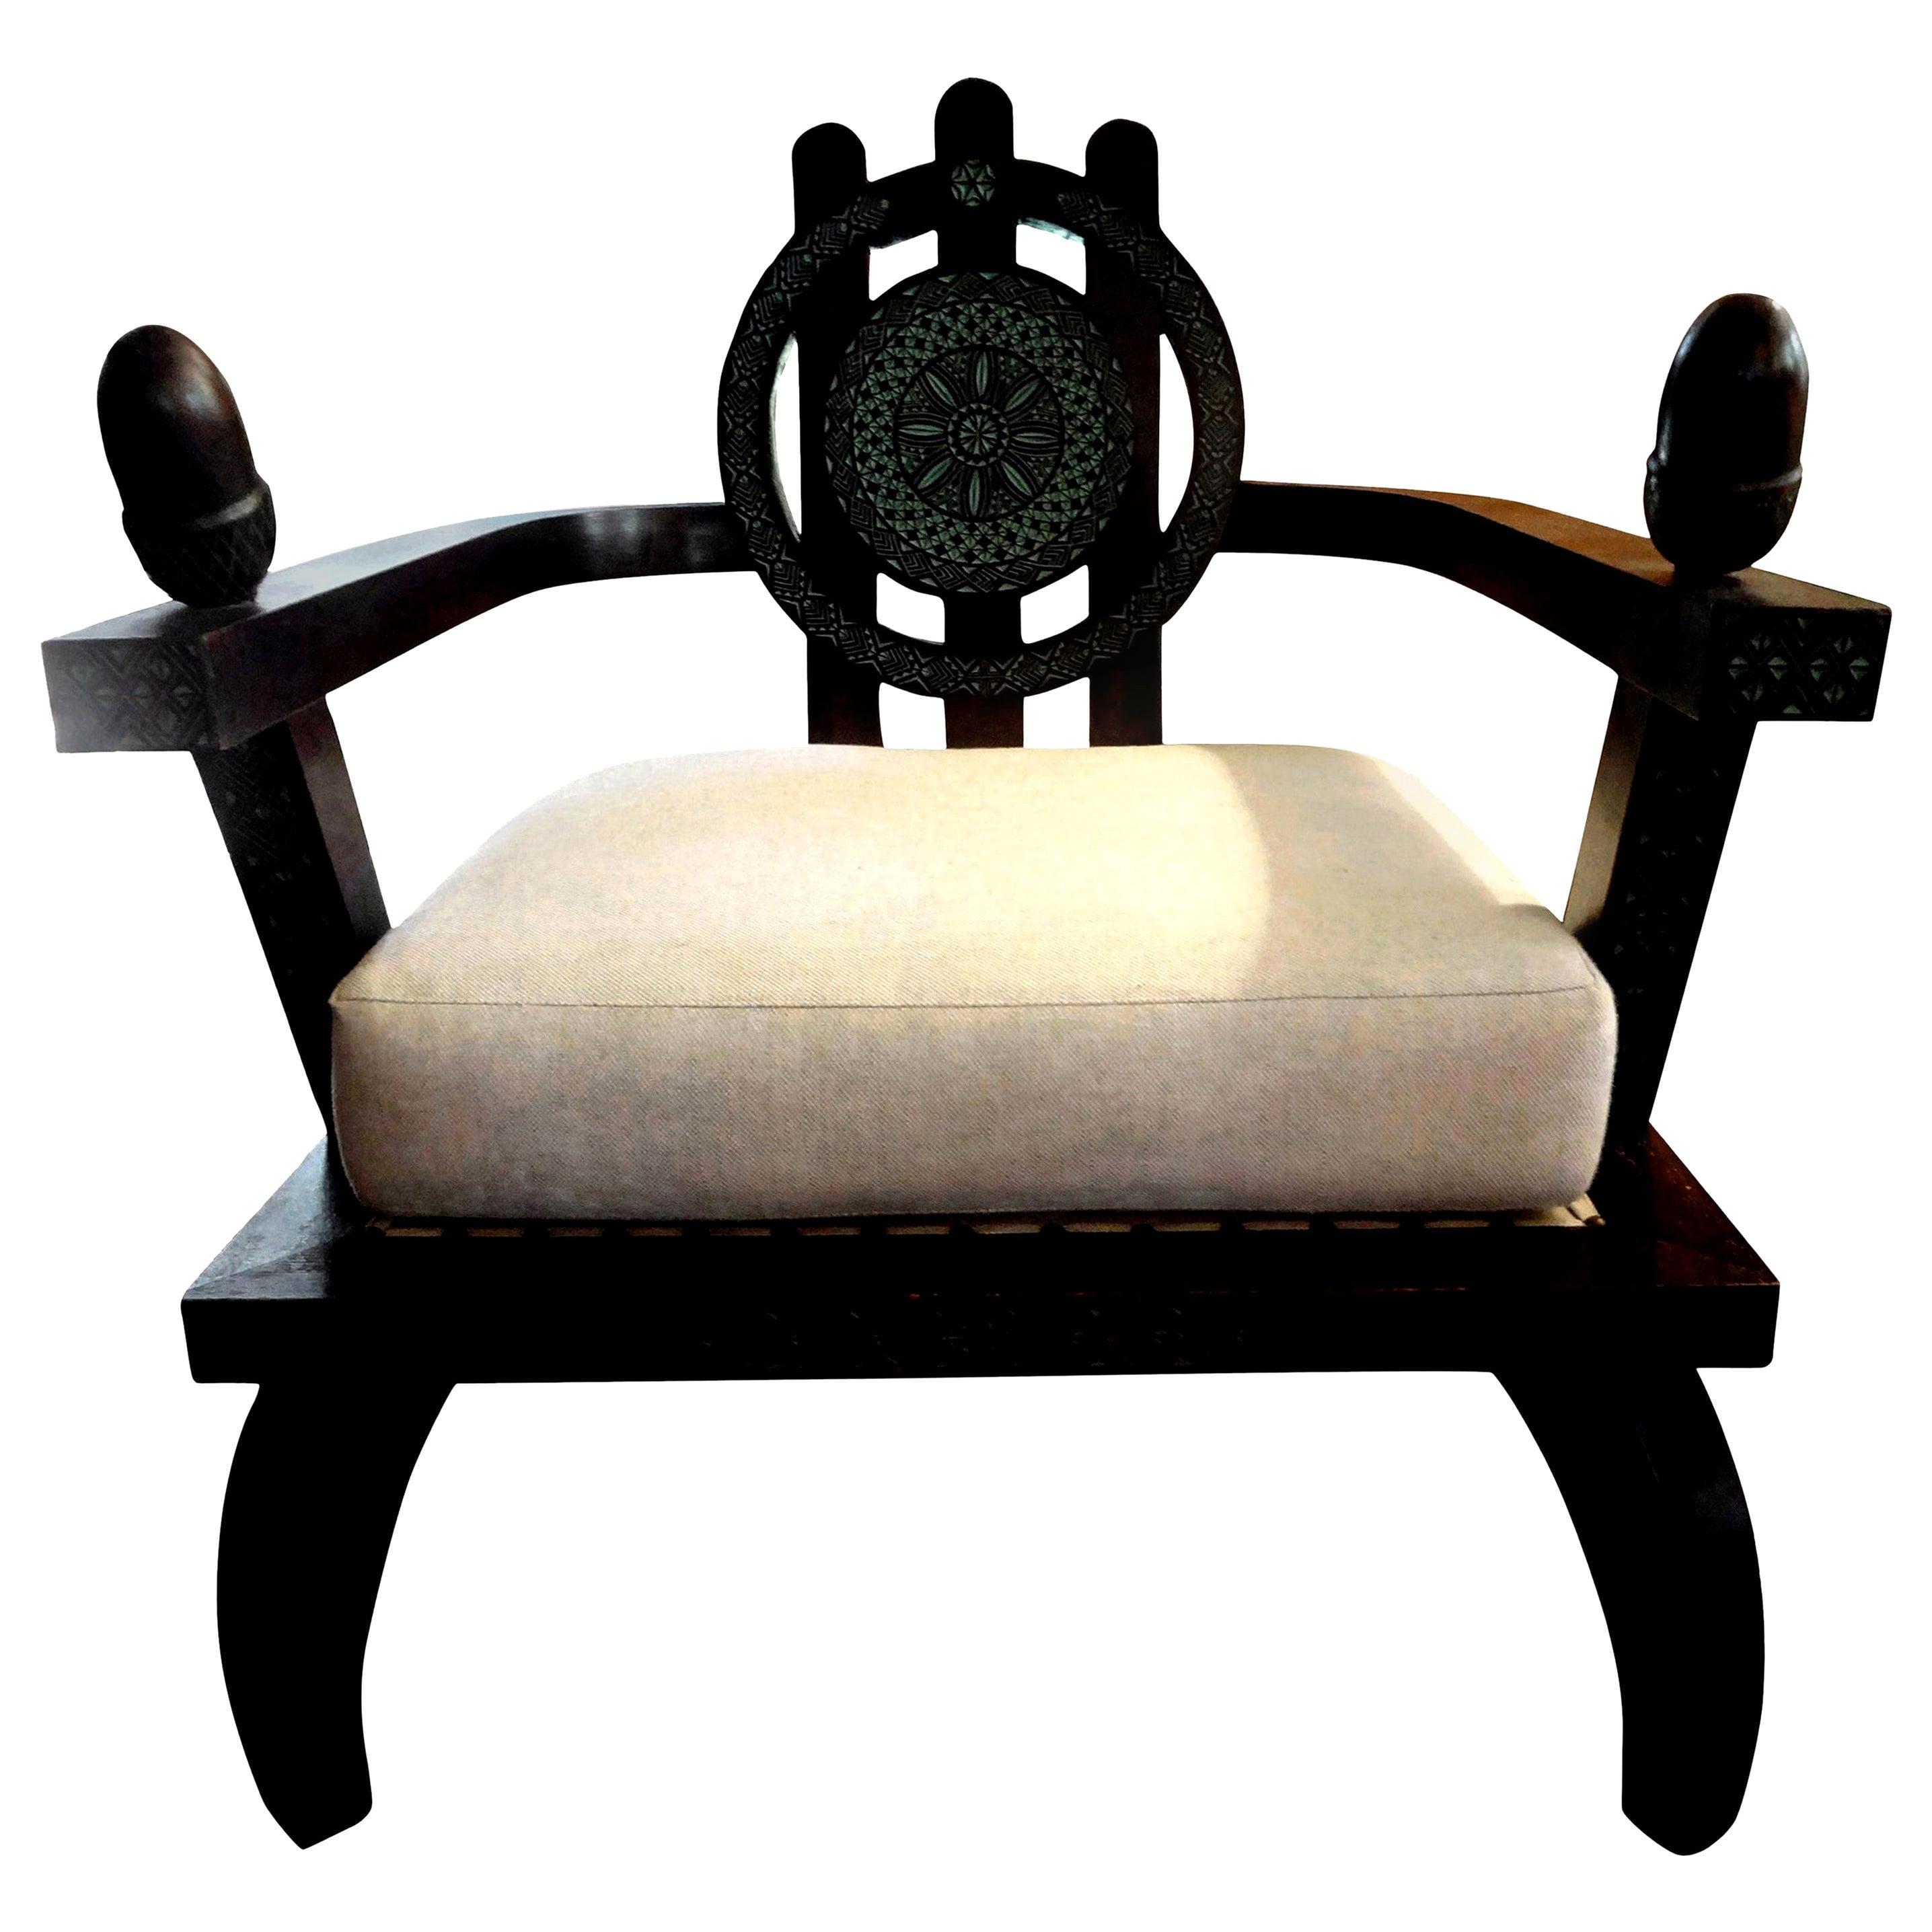 Italian Carlo Bugatti Inspired Lounge Chair by Ettore Zaccari, Milan